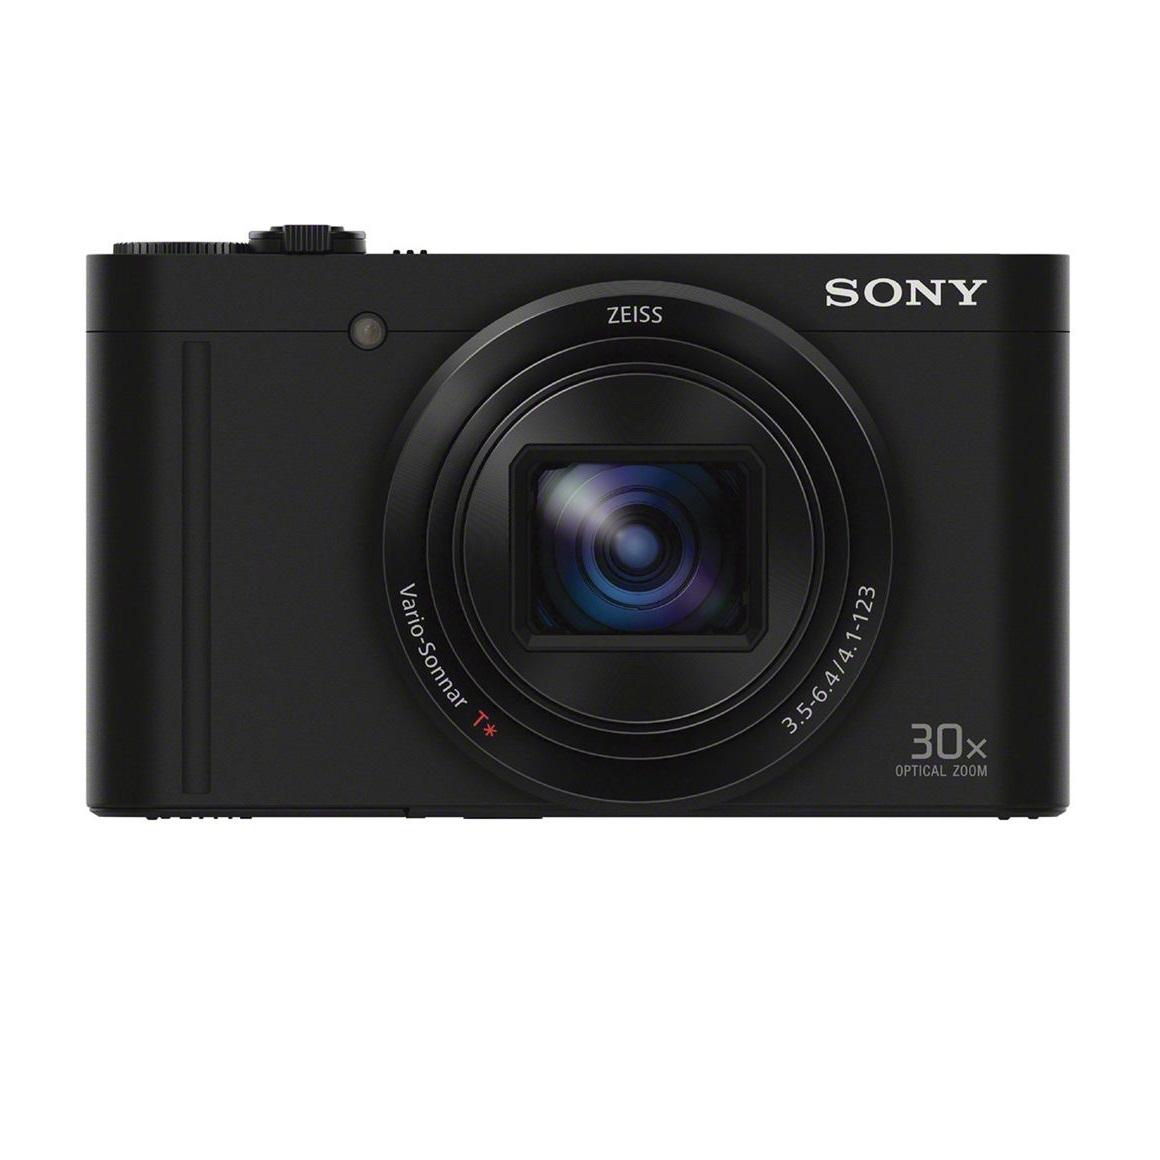 Máy ảnh KTS Sony Cybershot DSC-WX500